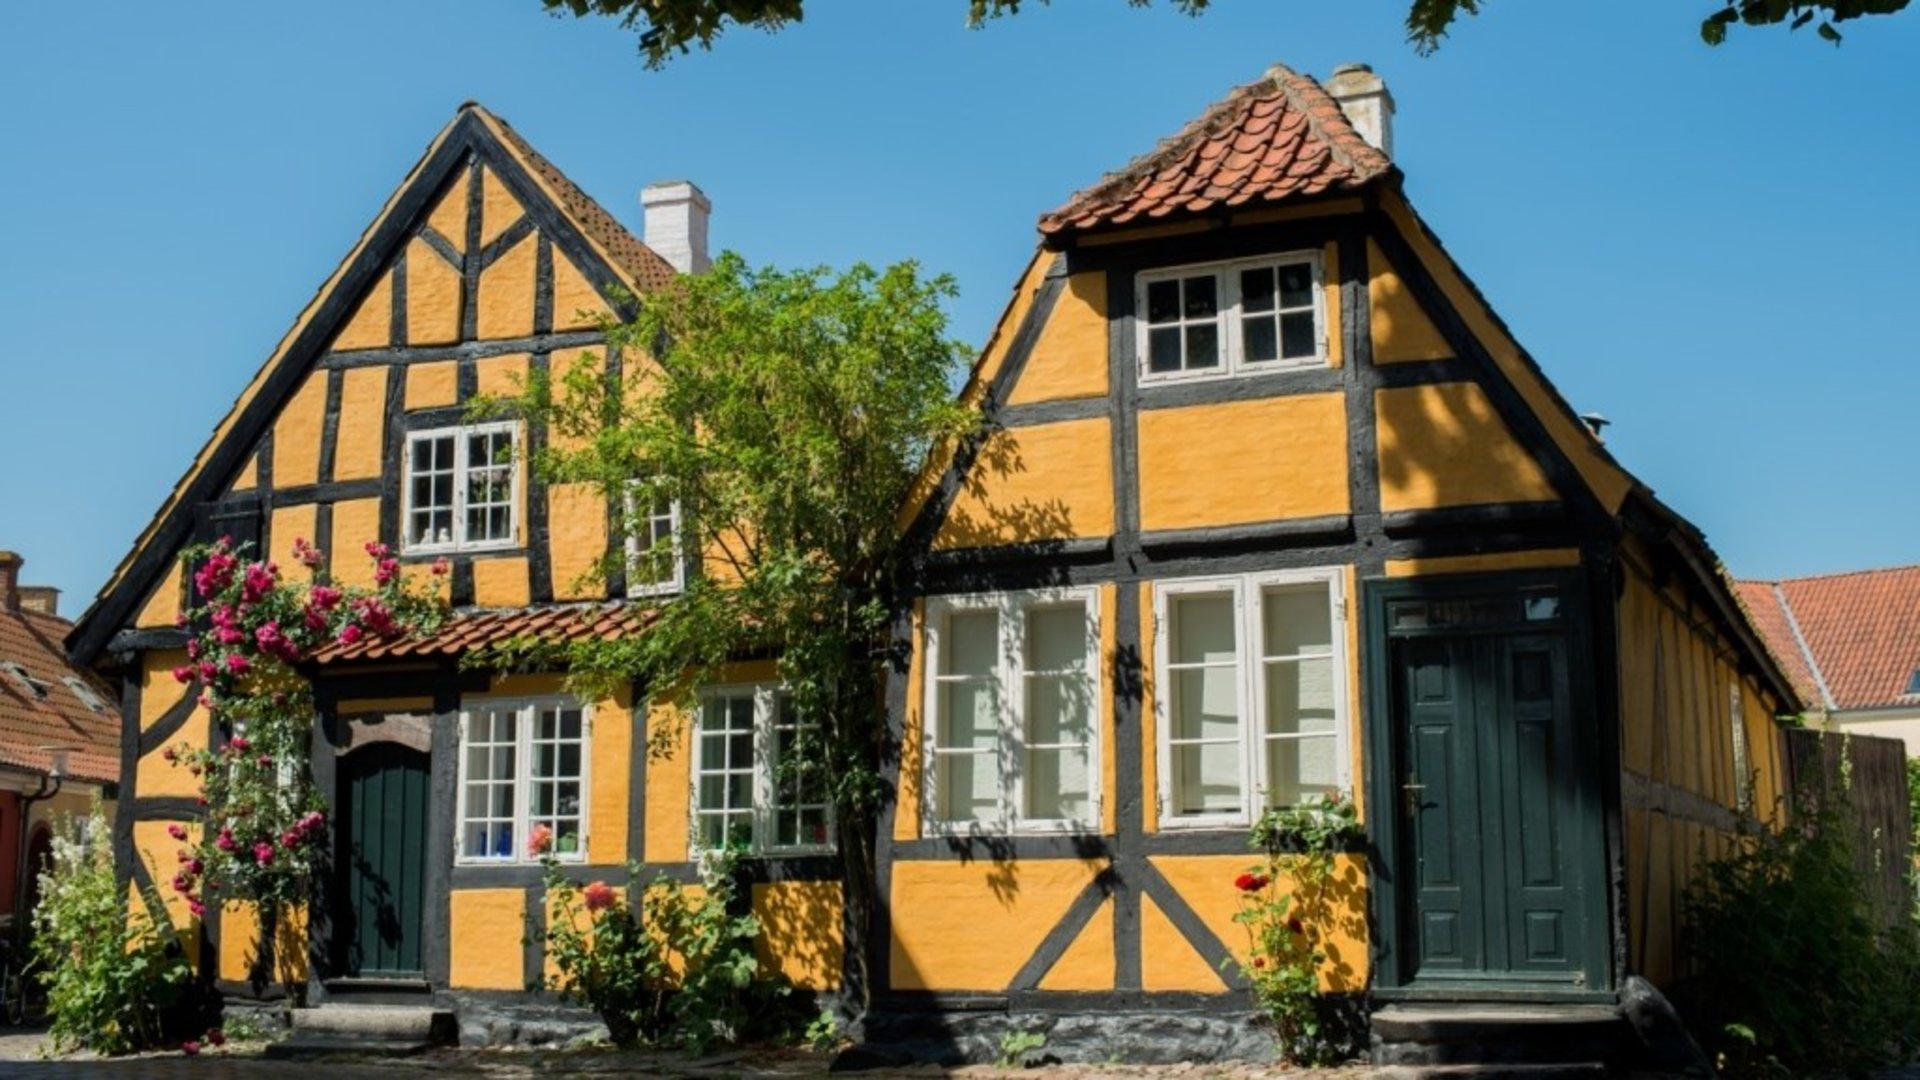 Denmark's most beautiful towns Thumbnail